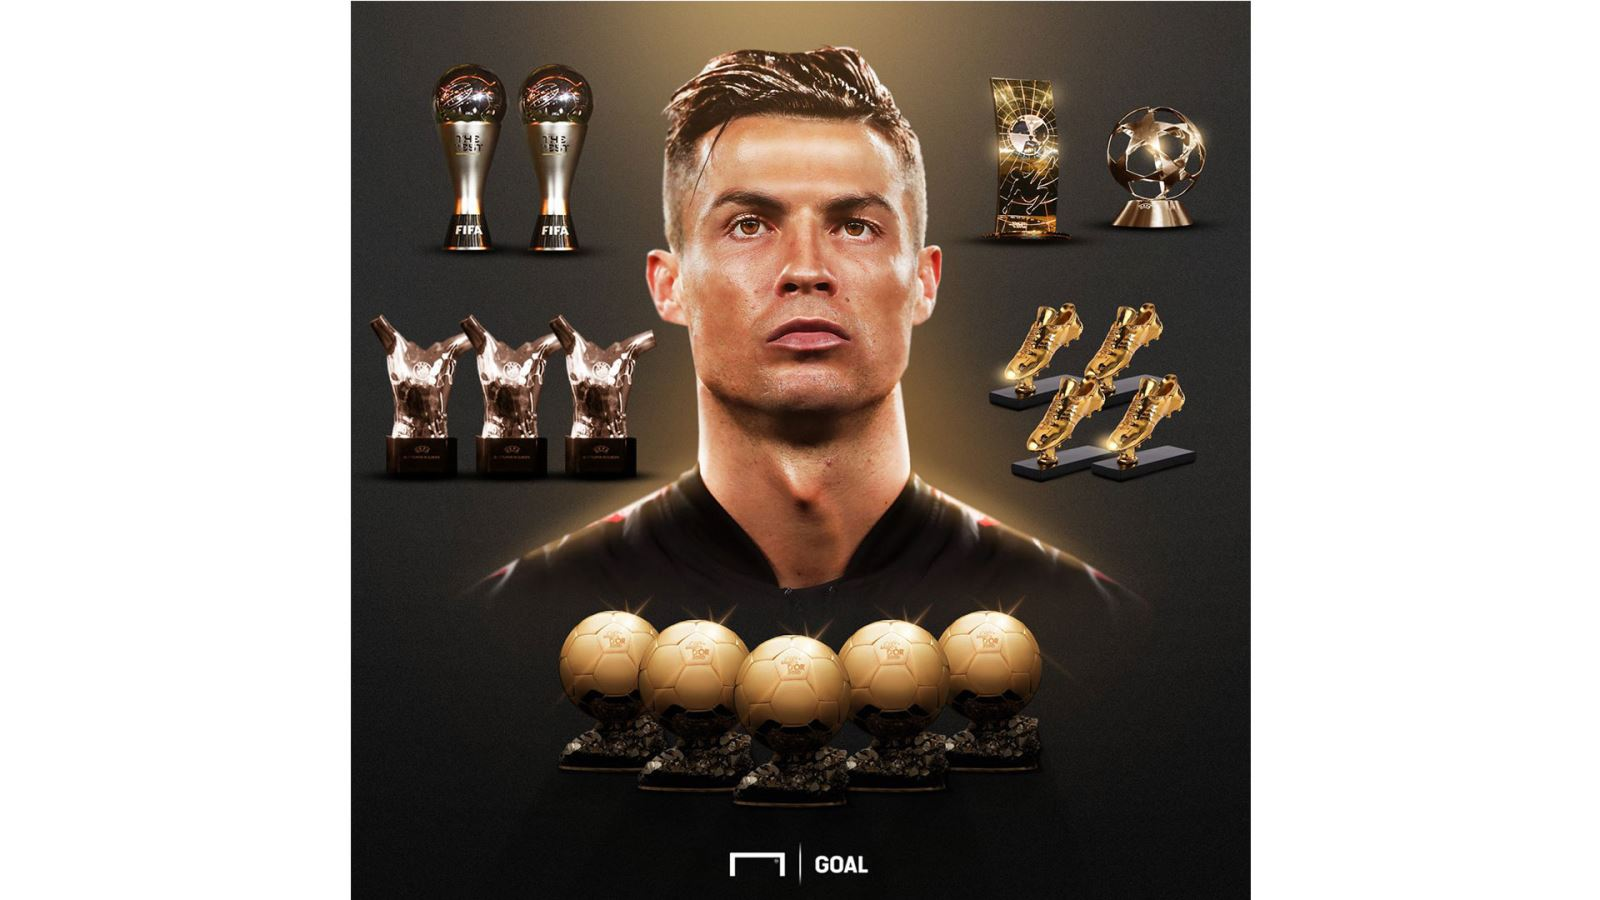 bong da, FIFA The Best 2019, The Best 2019, trực tiếp The Best 2019, xem trực tiếp The Best 2019 ở đâu, Cầu thủ hay nhất, Messi, Ronaldo, Van Dijk, HLV hay nhất